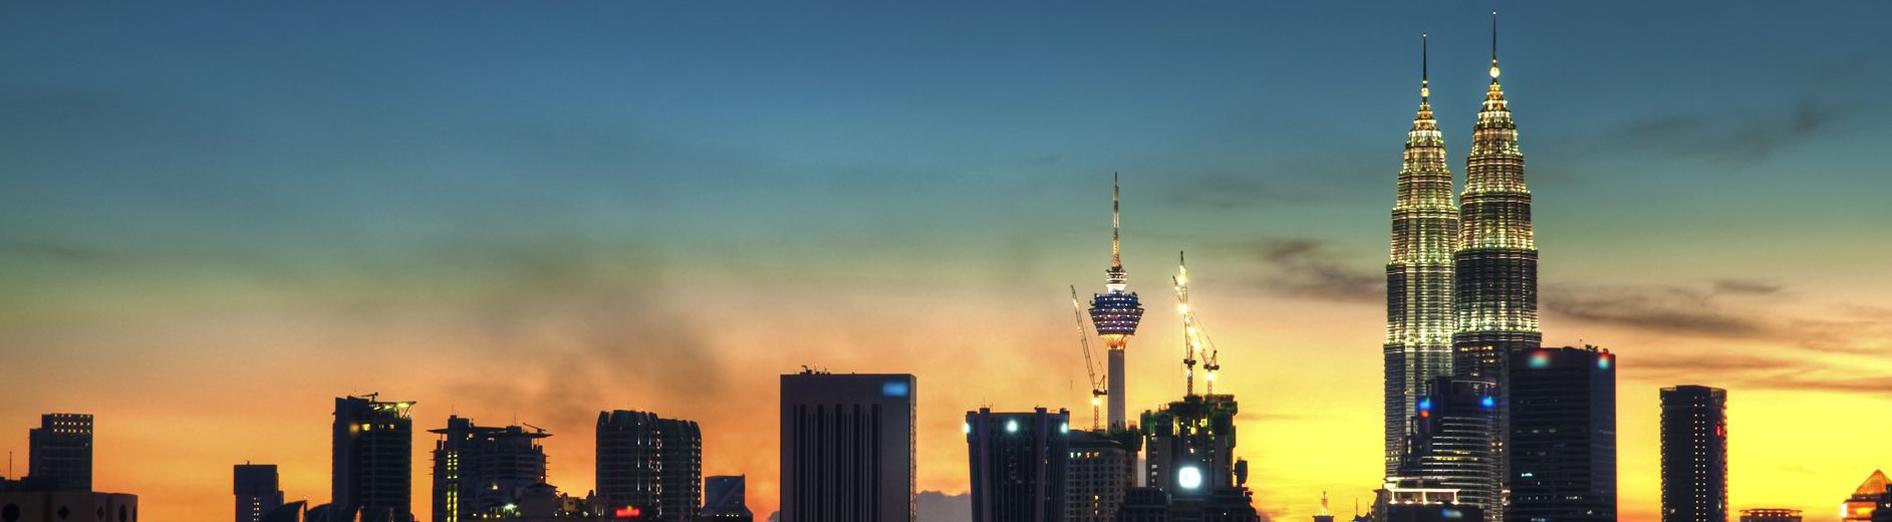 7152934 - kuala lumpur is the capital city of malaysia.